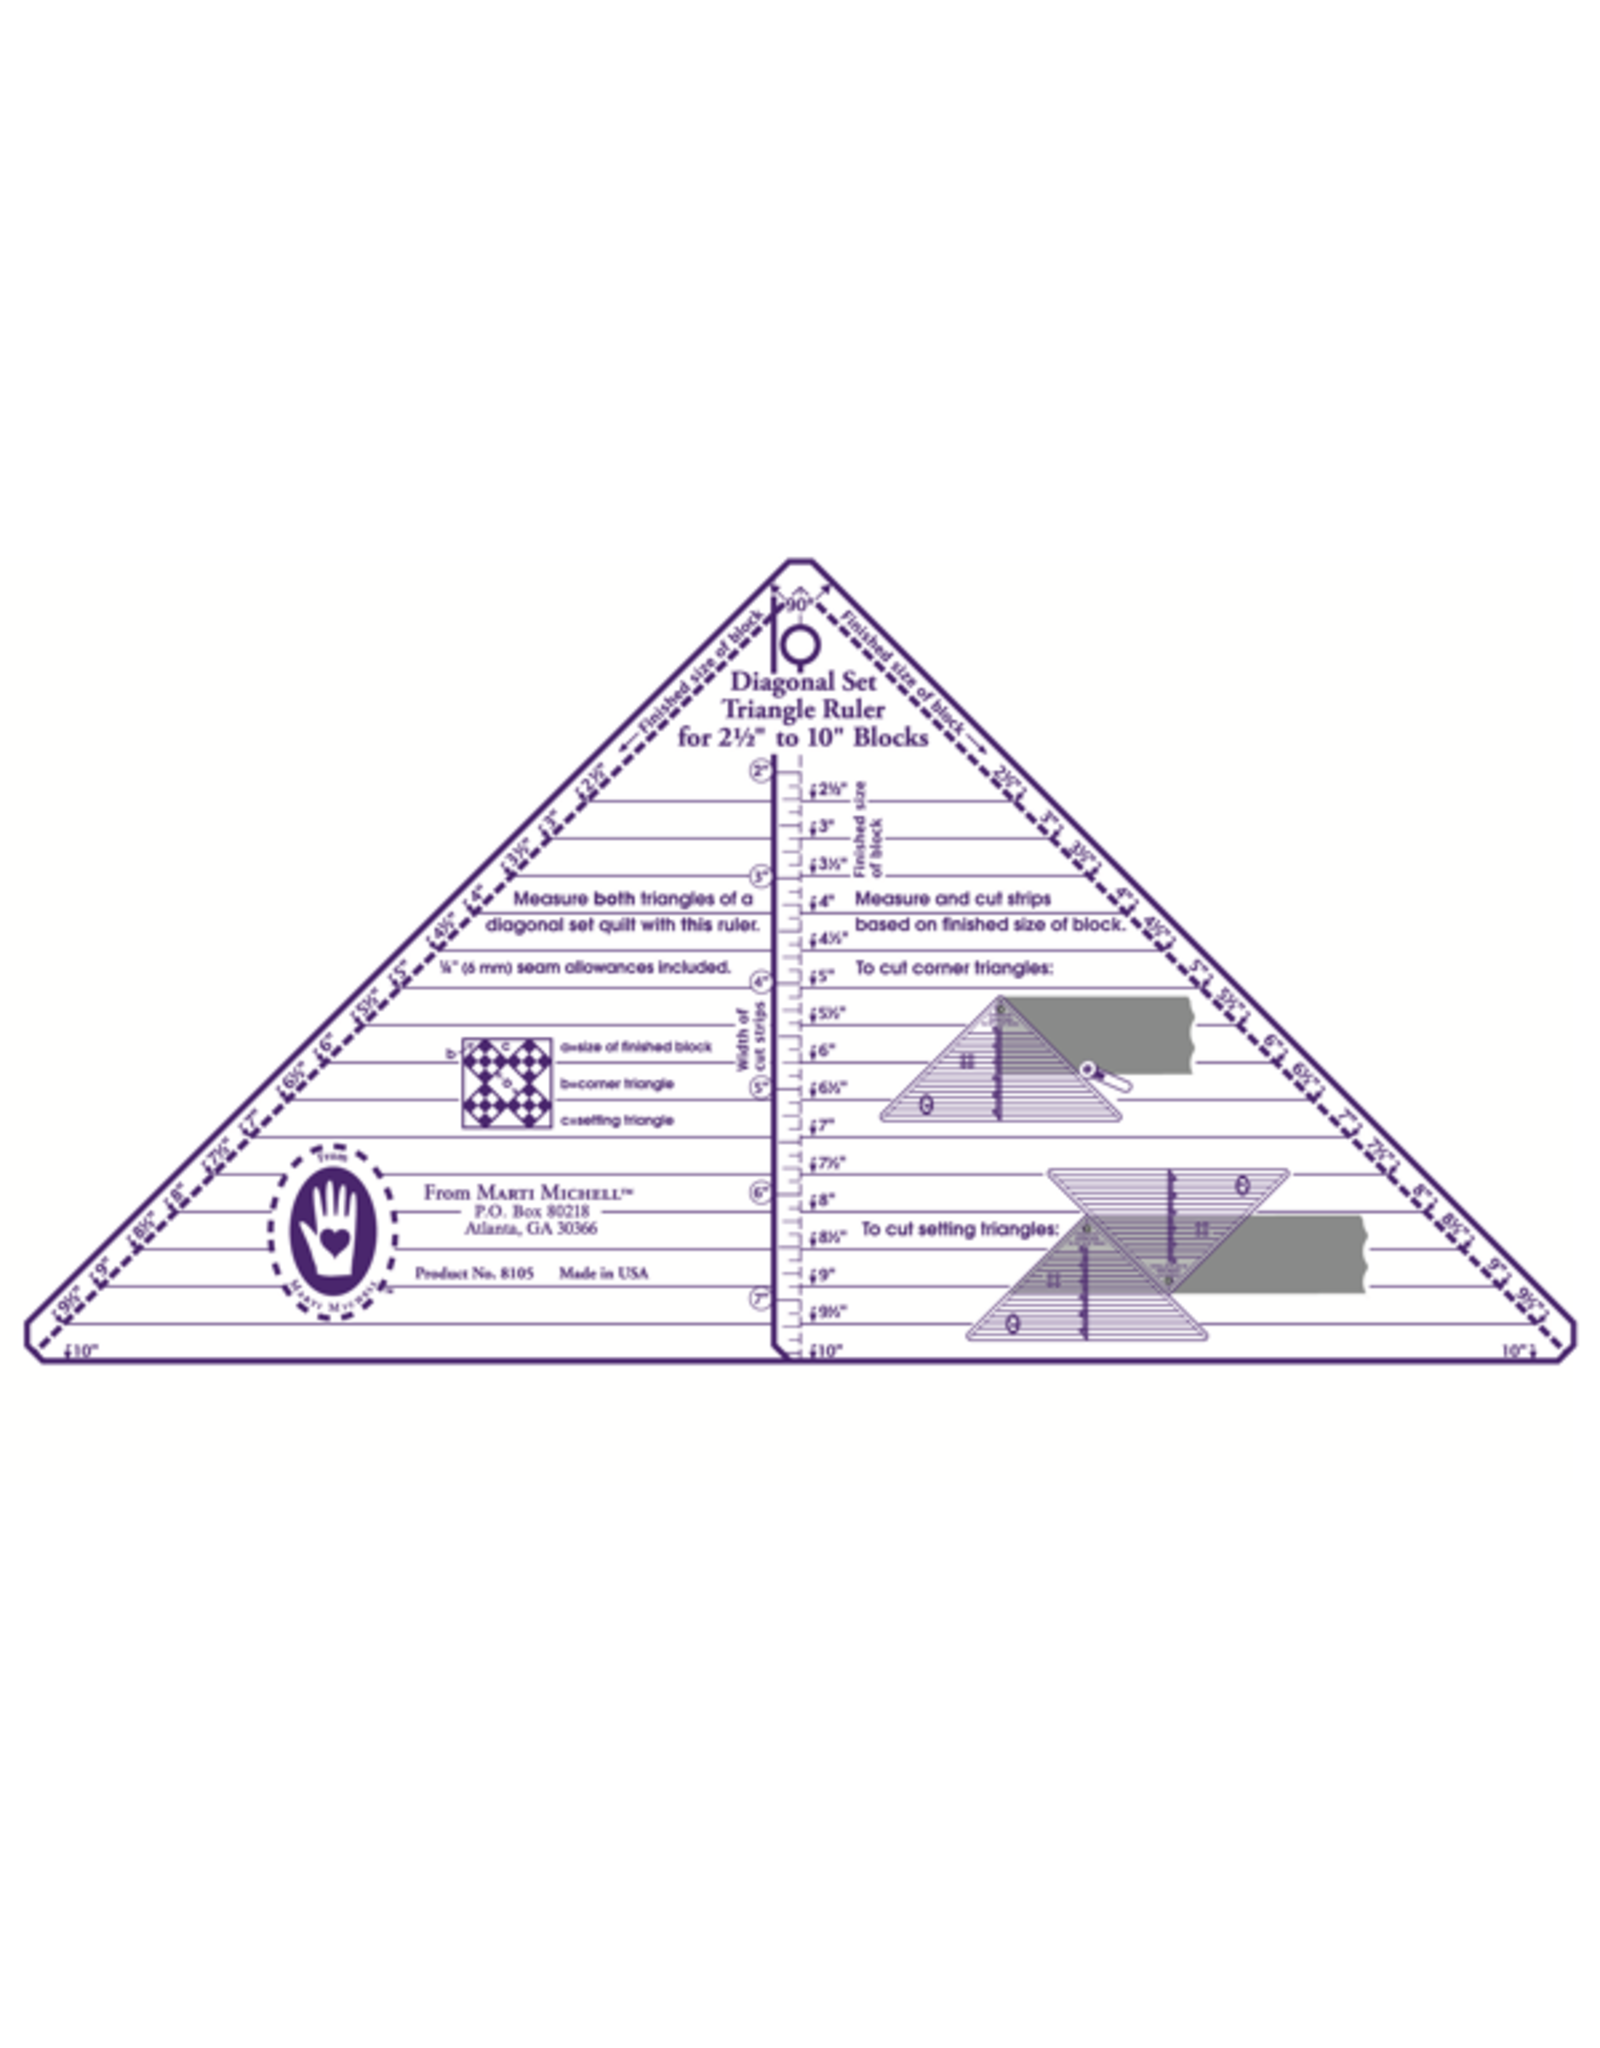 Marti Michell Diagonal Set Full Triangle Ruler - 2,5-10 inch blocks